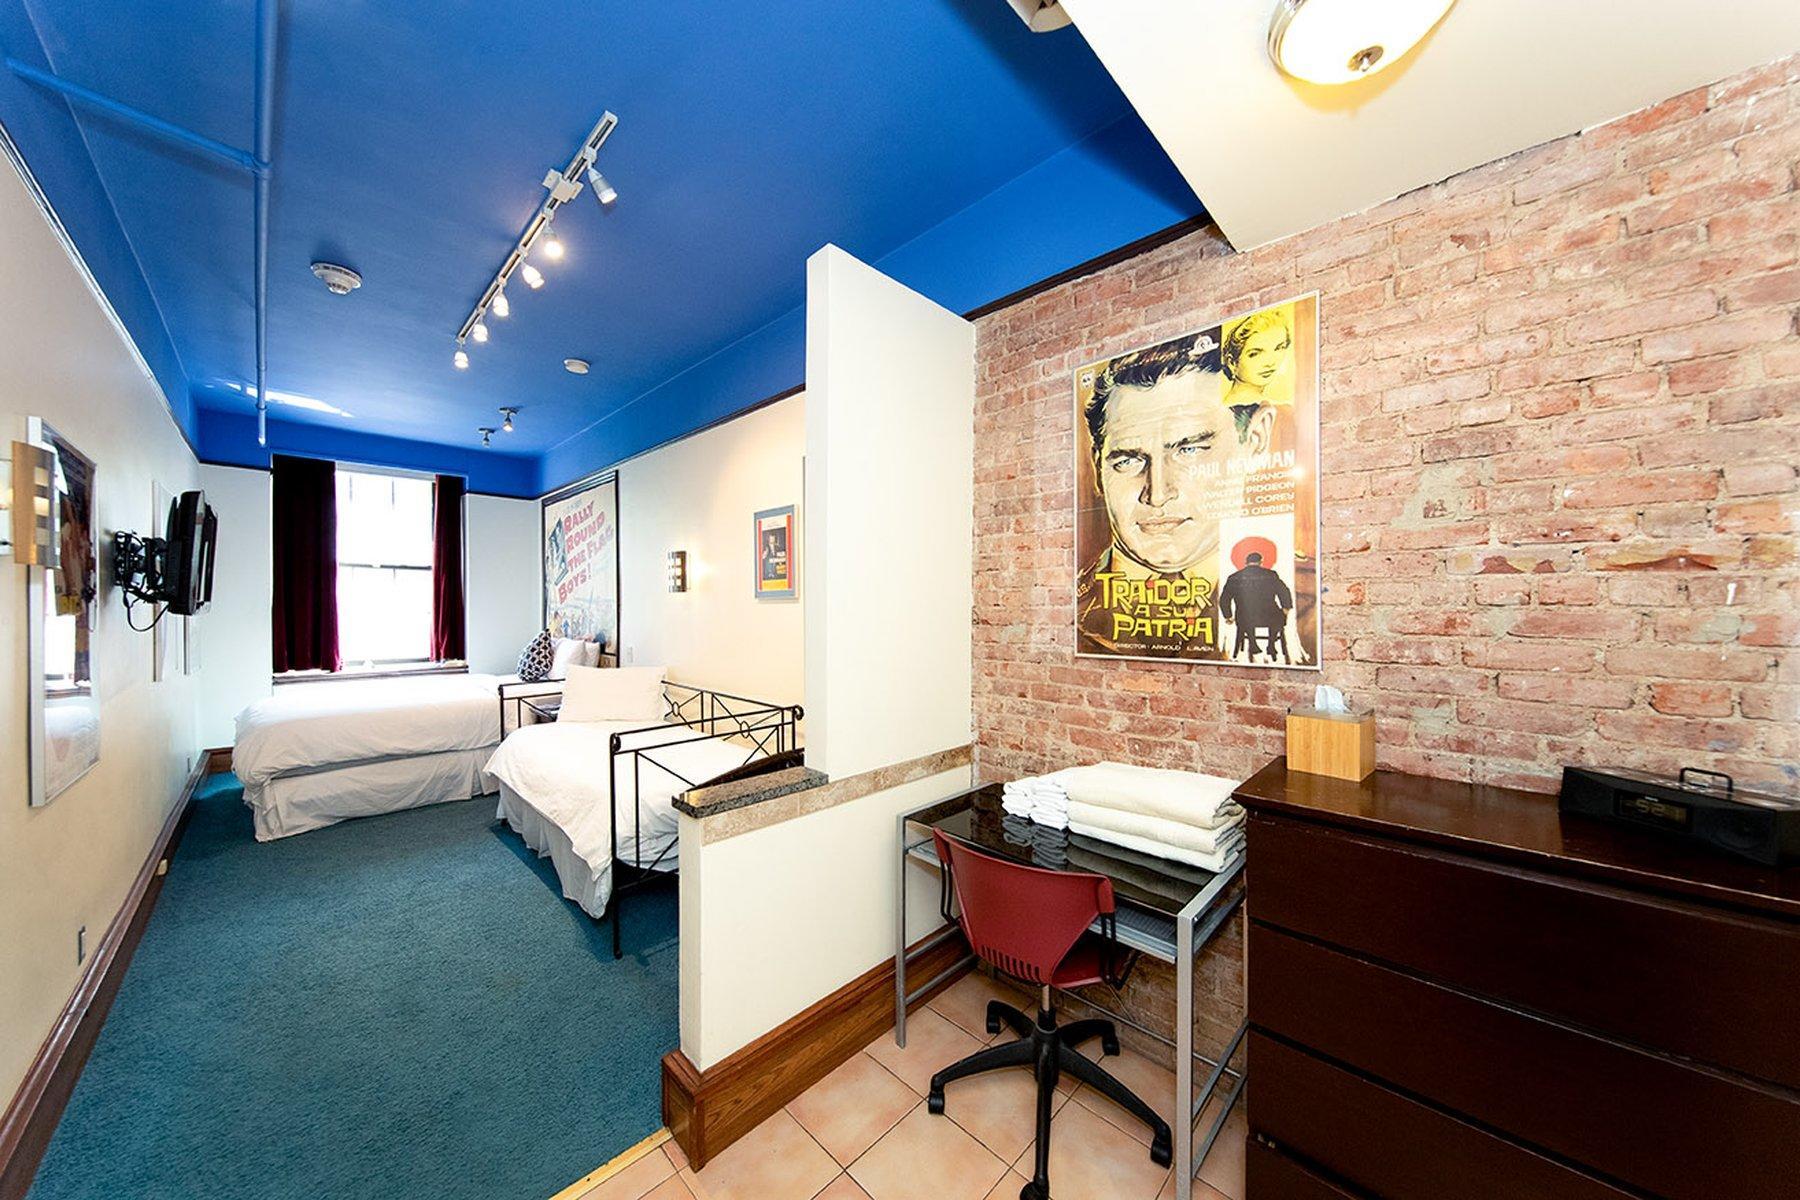 Hotel room with Traidor a su Patria movie theme.